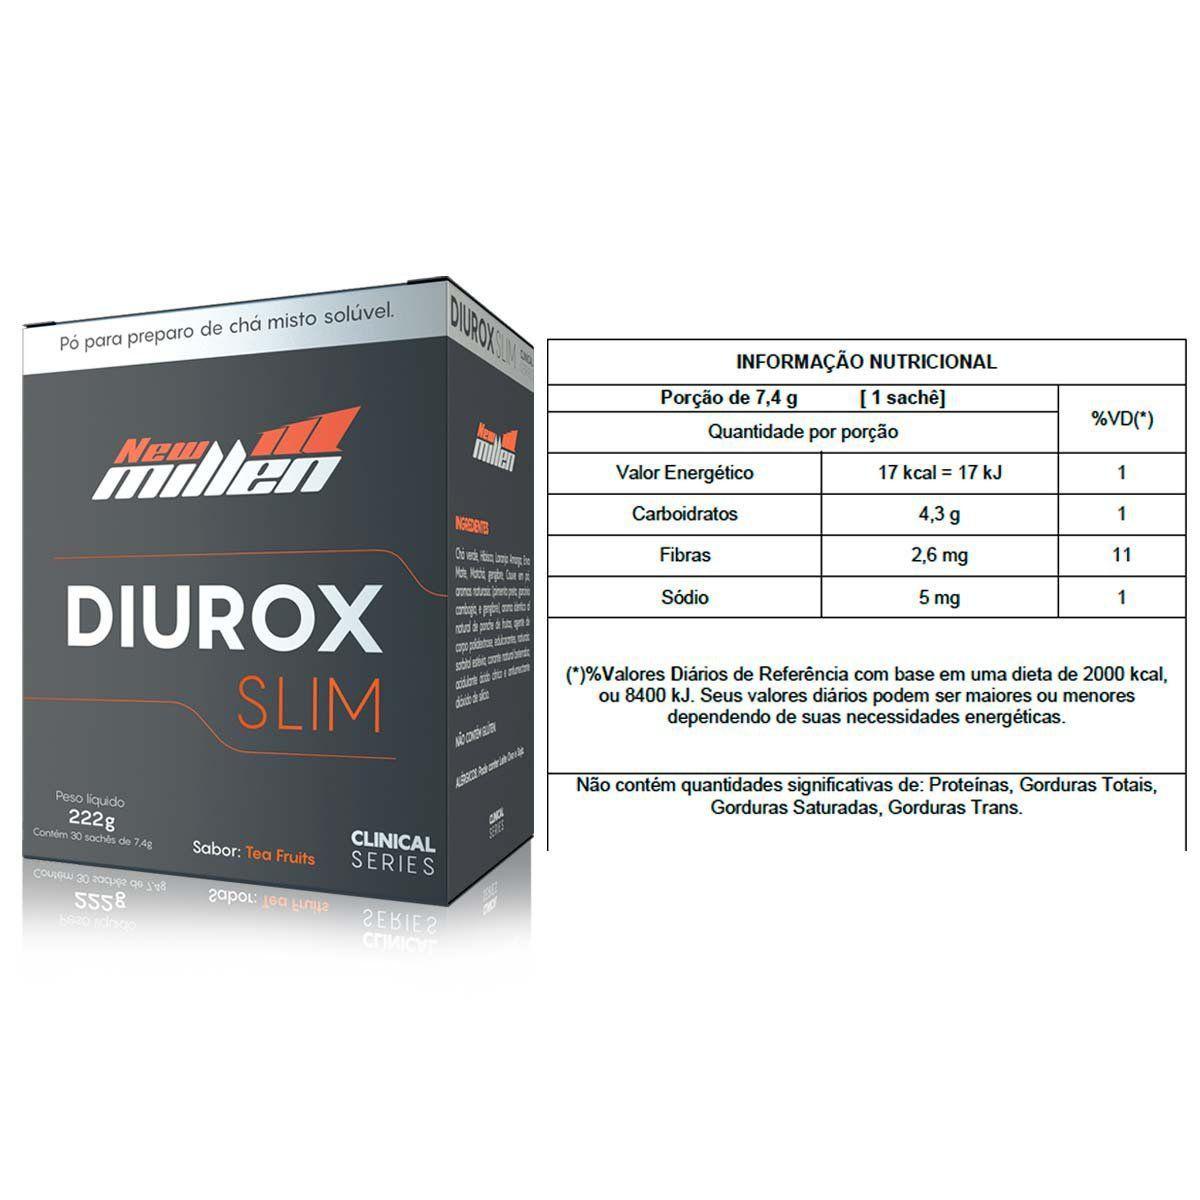 Diurox Slim 30 Sachês New Millen  - Vitta Gold